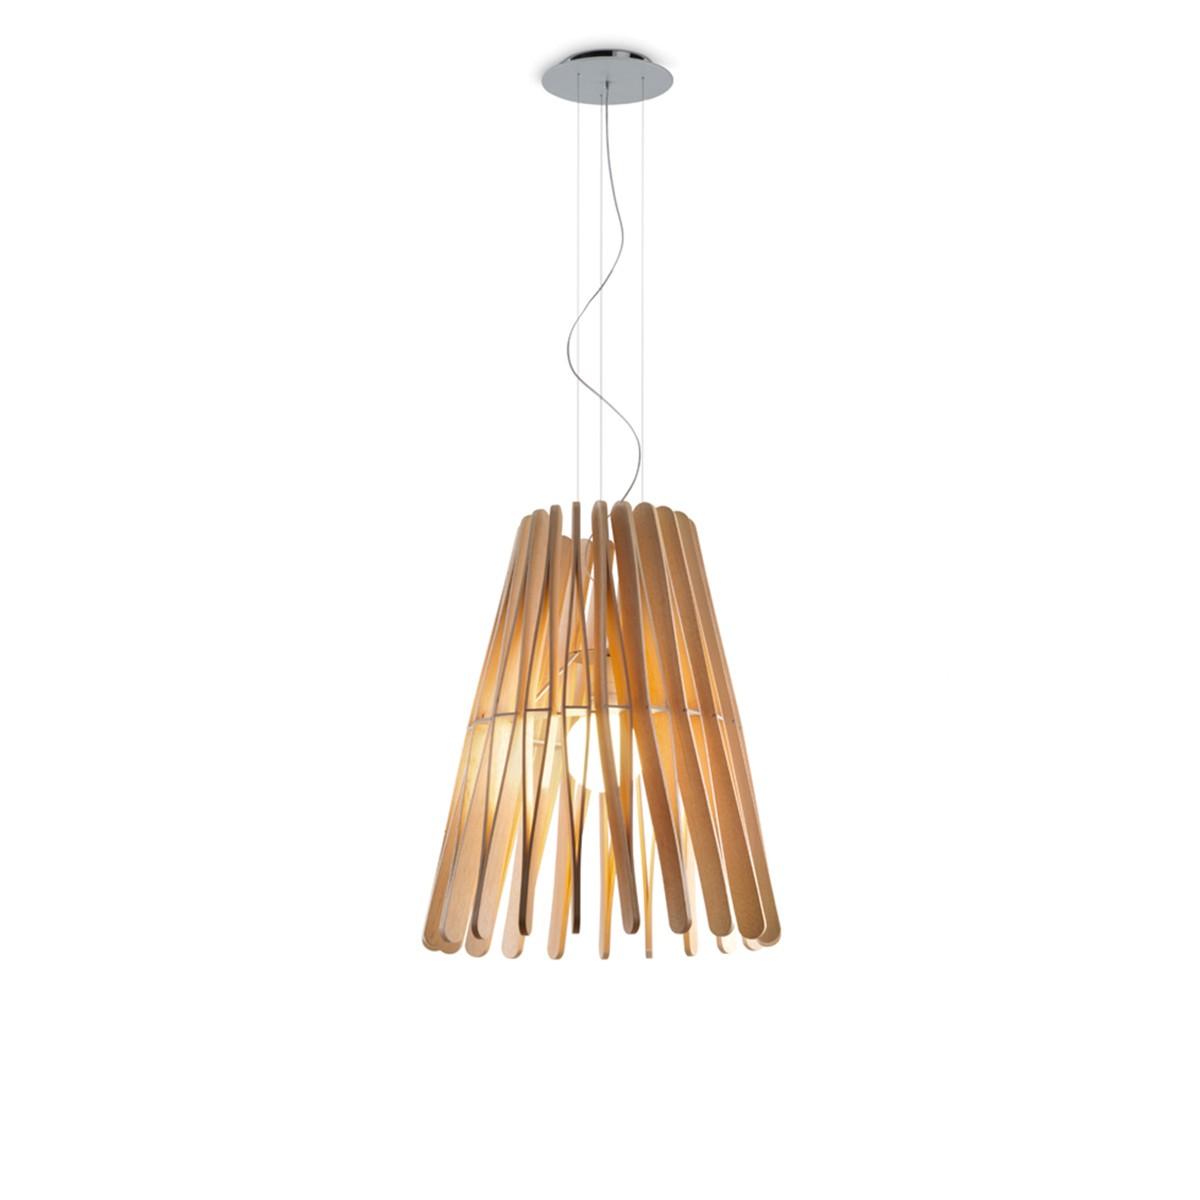 Fabbian Stick Cono Pendelleuchte LED (E27), Holz